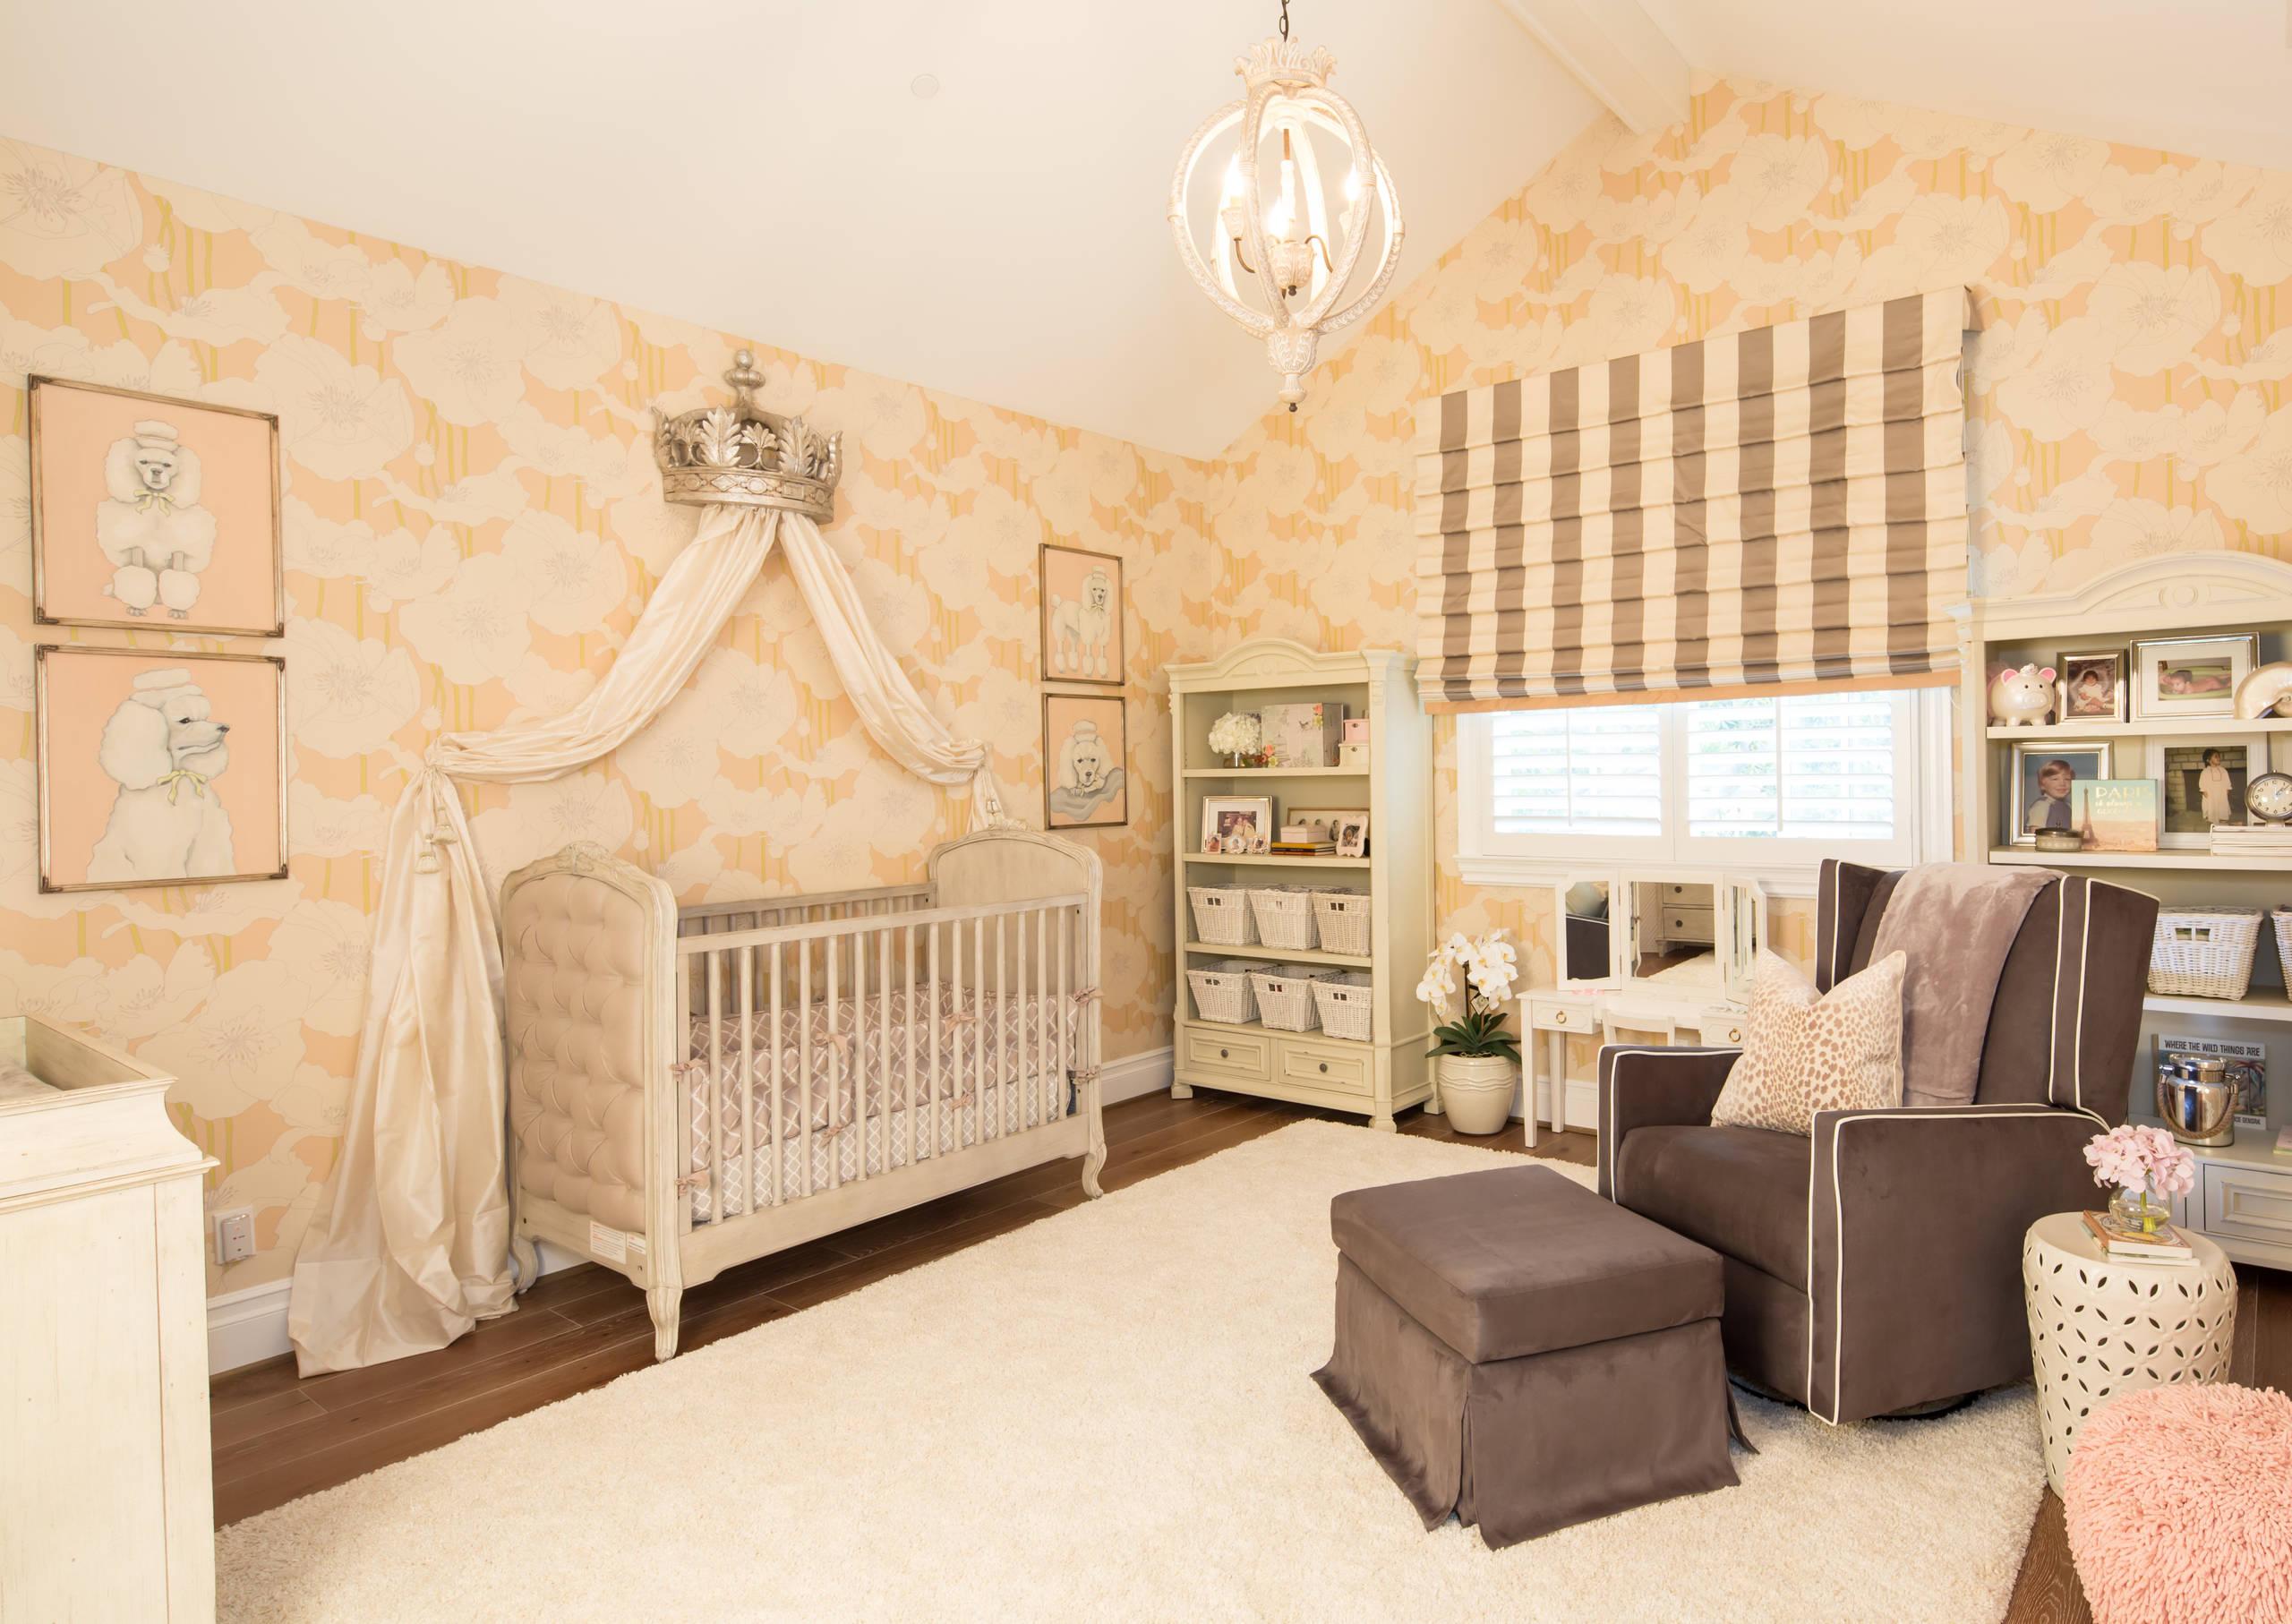 75 Beautiful Nursery Pictures Ideas Color Orange February 2021 Houzz